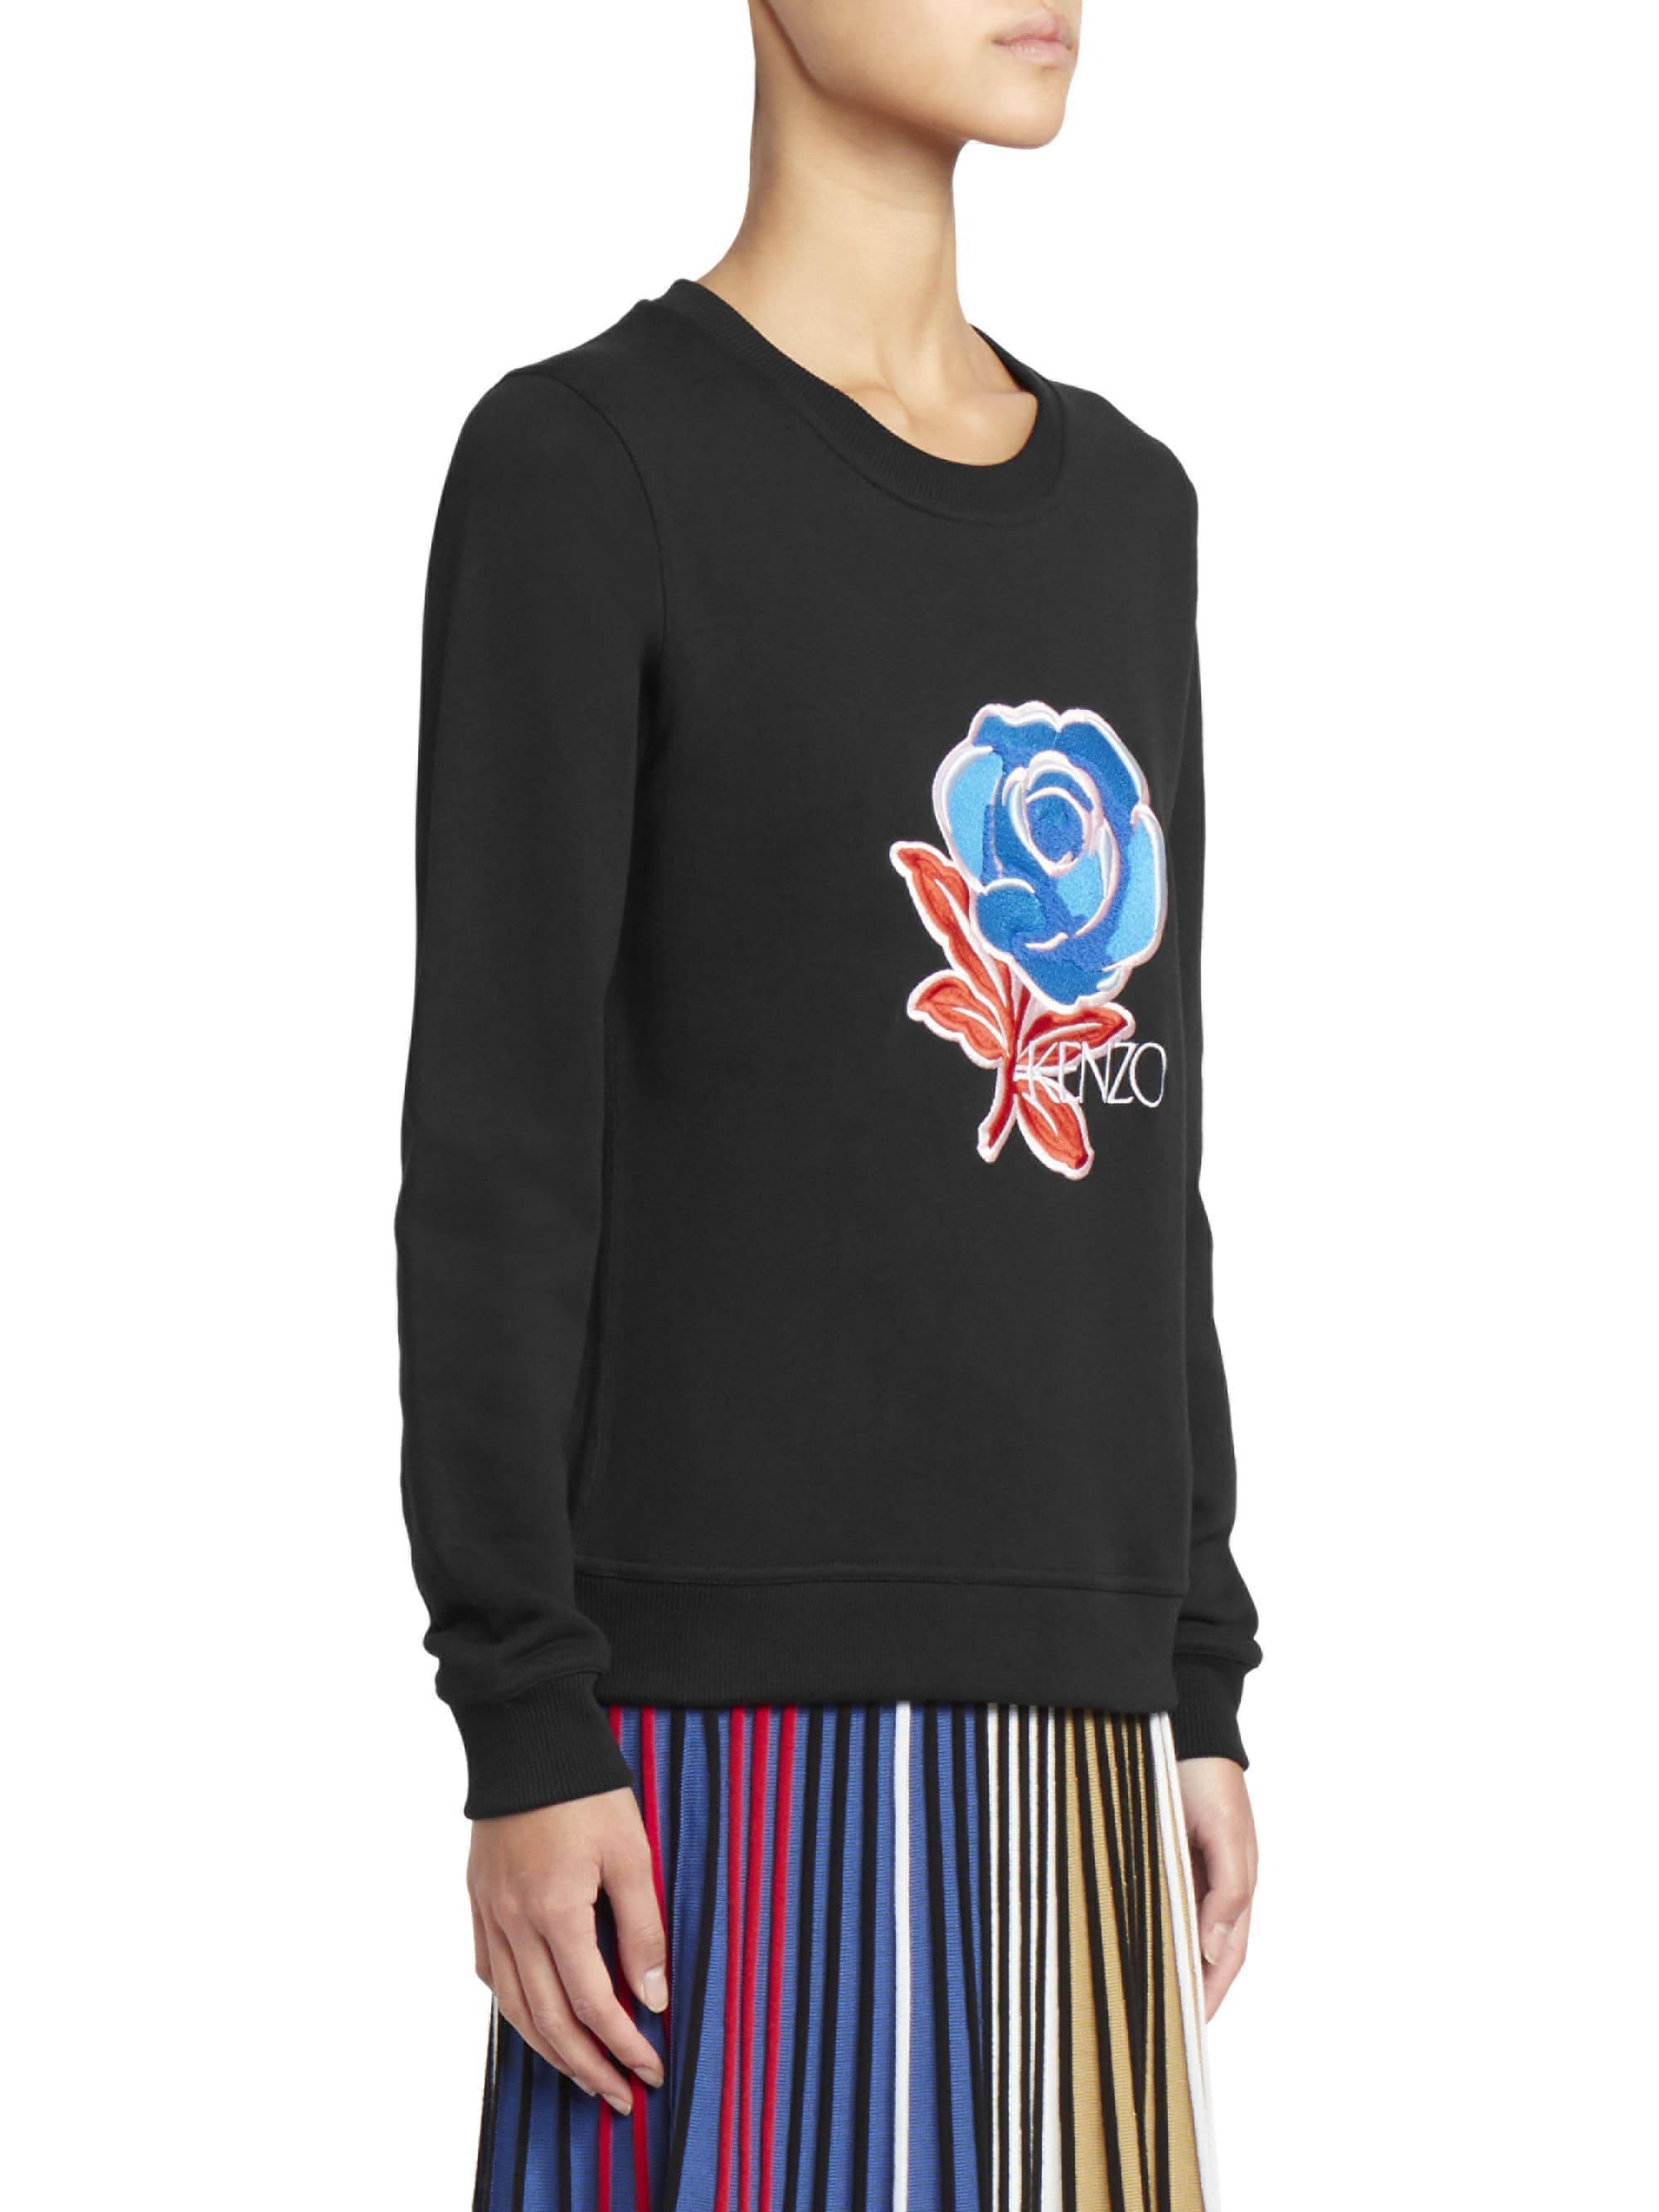 fdd922c3843e Lyst - KENZO Women's Embroidered Rose Sweatshirt - Black - Size Xs in Black